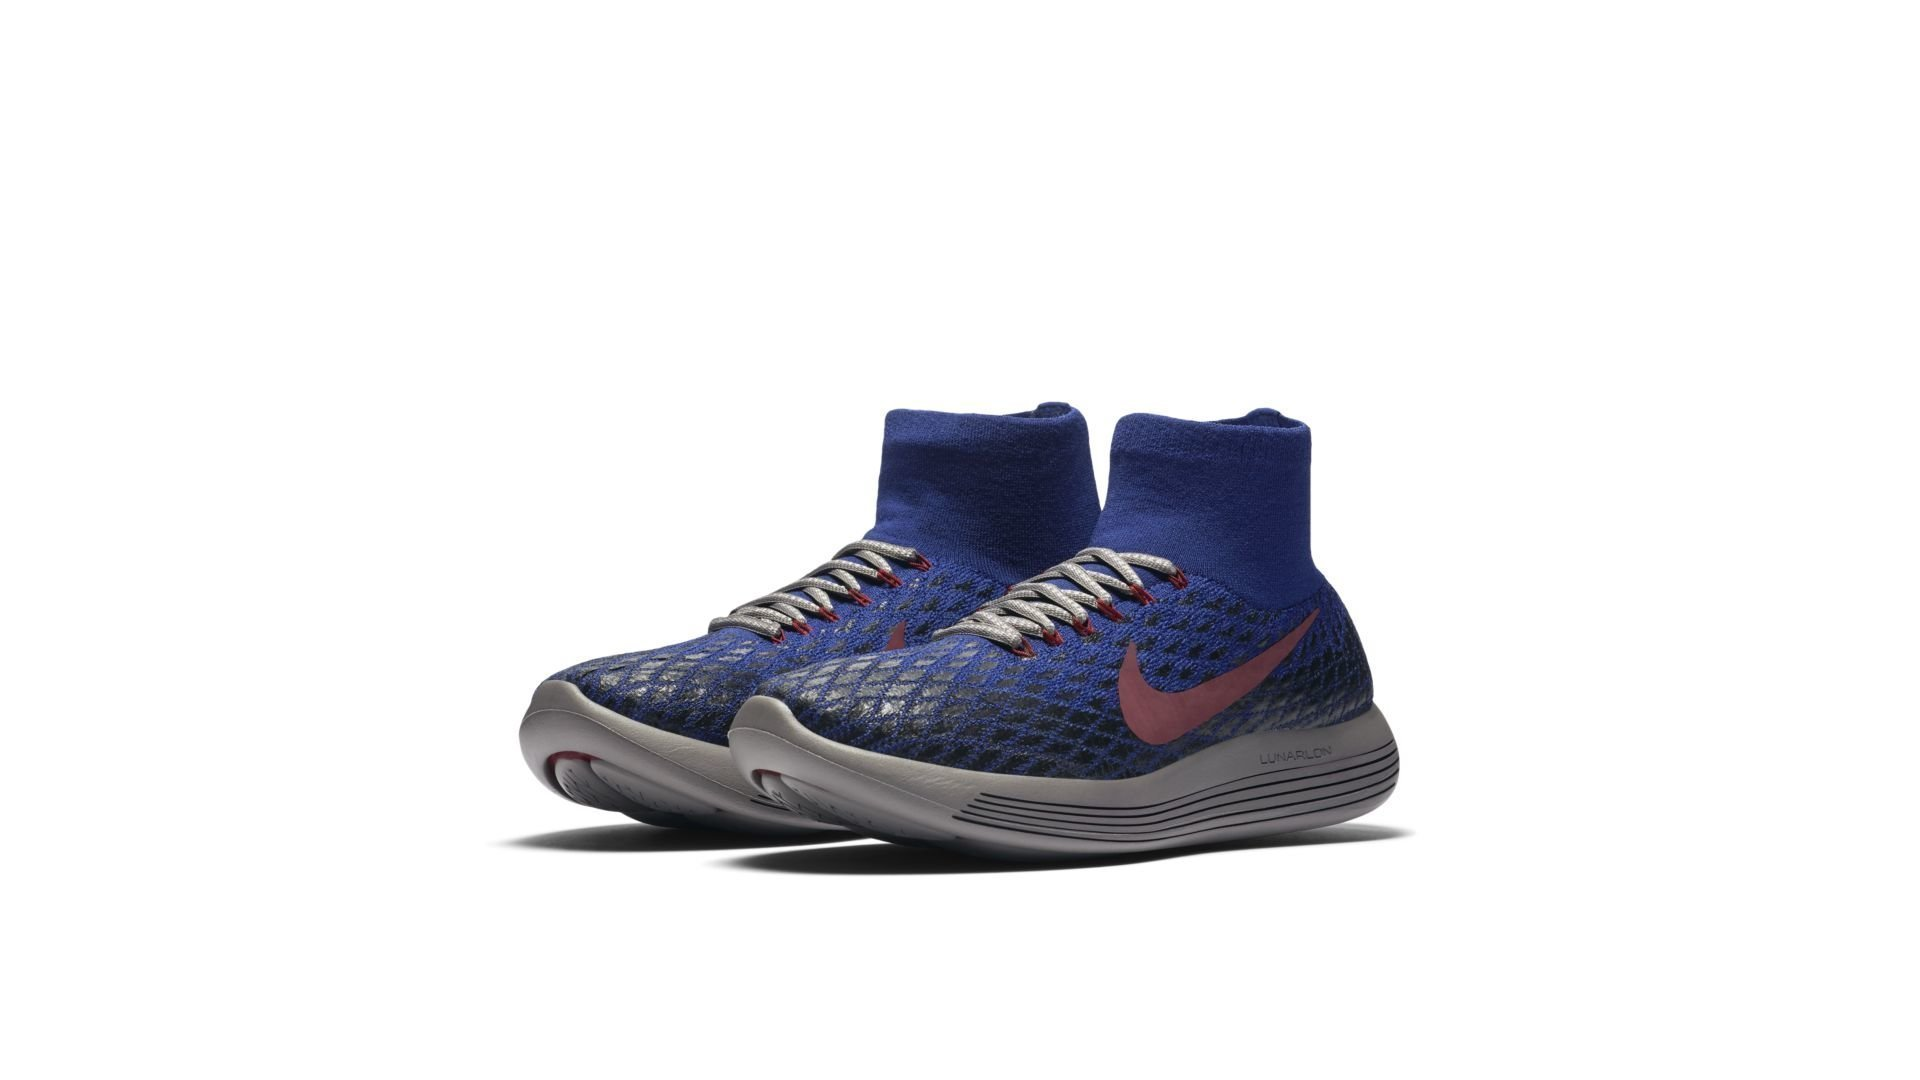 Nike LunarEpic Flyknit Shield Gyakusou Blue (859891-400)